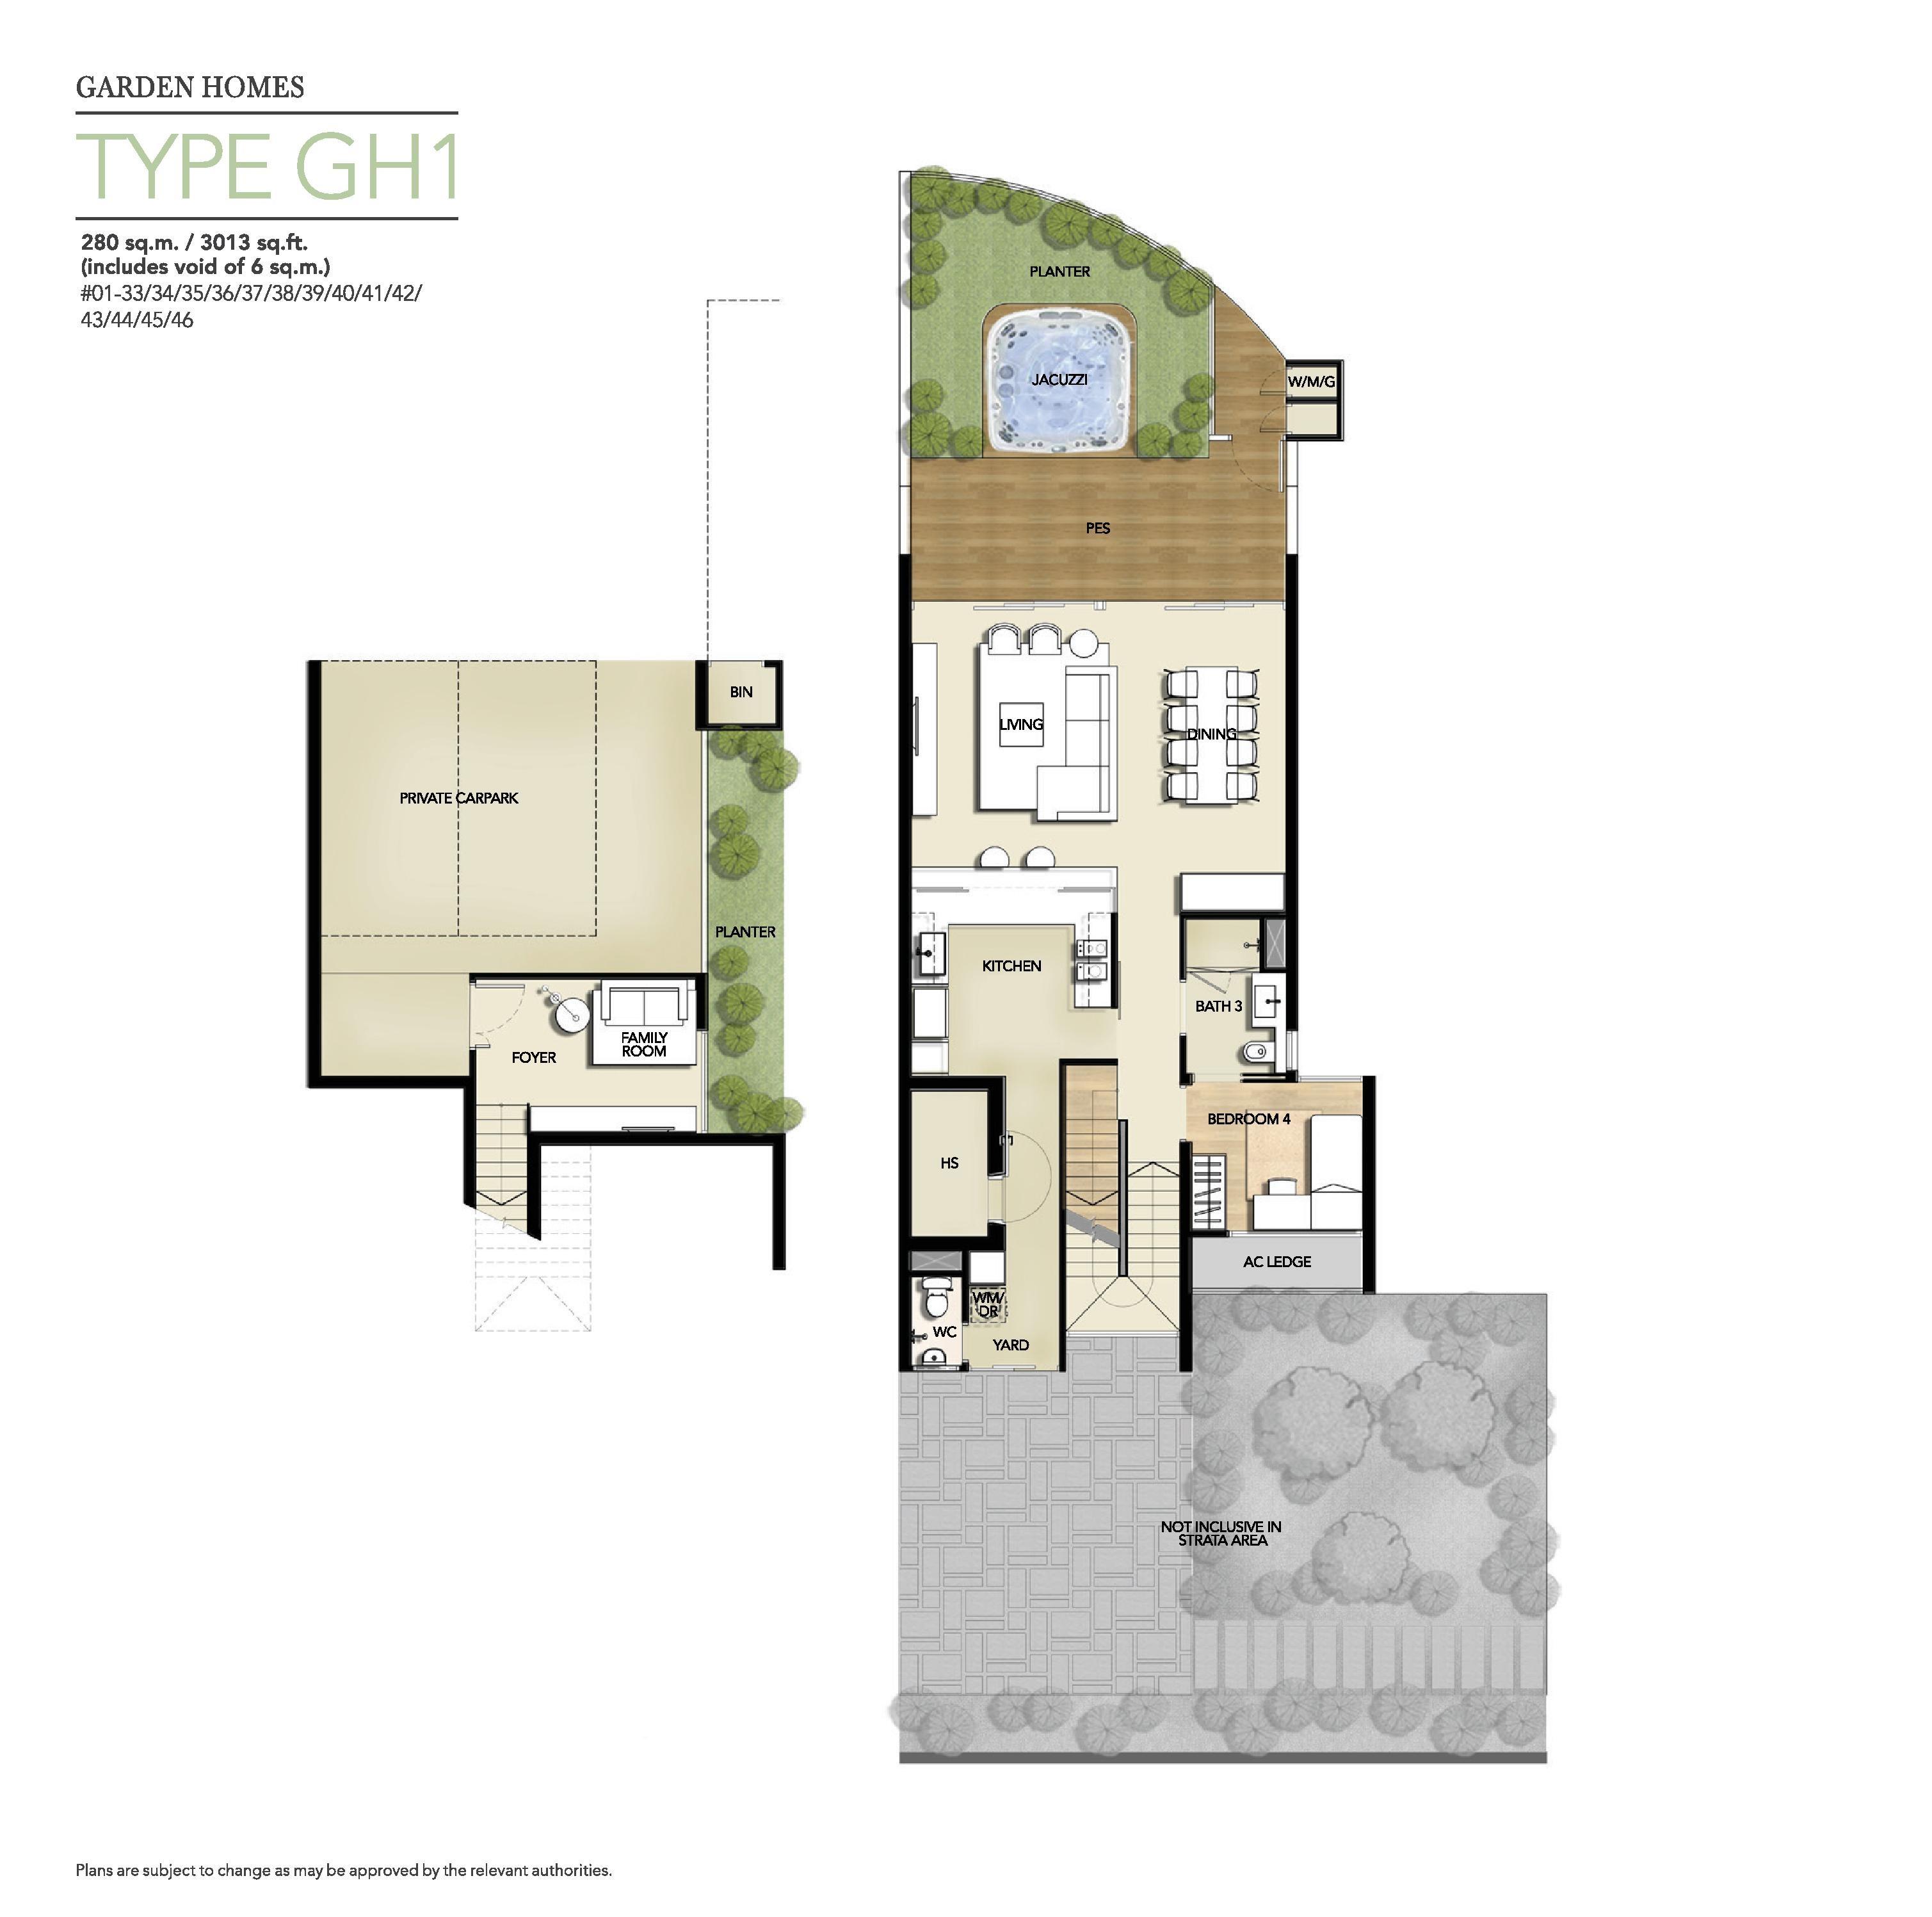 Palm Isles 4 Bedroom Garden Homes Type Gh1 Lower Level Floor Plans